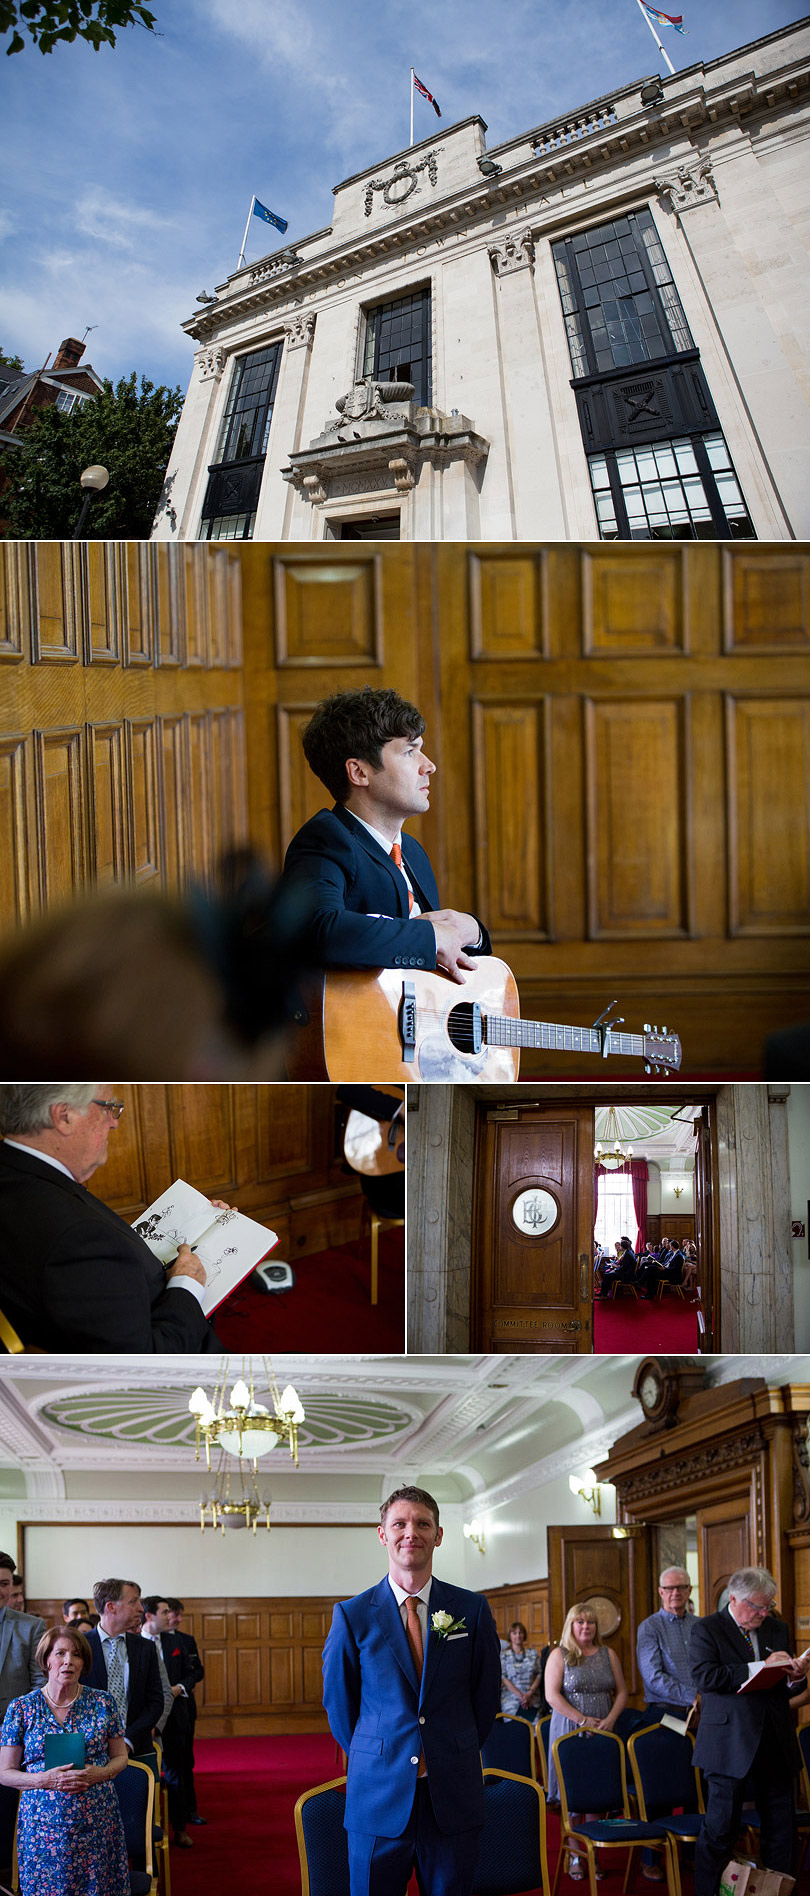 Islington-Town-Hall-Wedding-Jugged-Hare-Reception-05.jpg